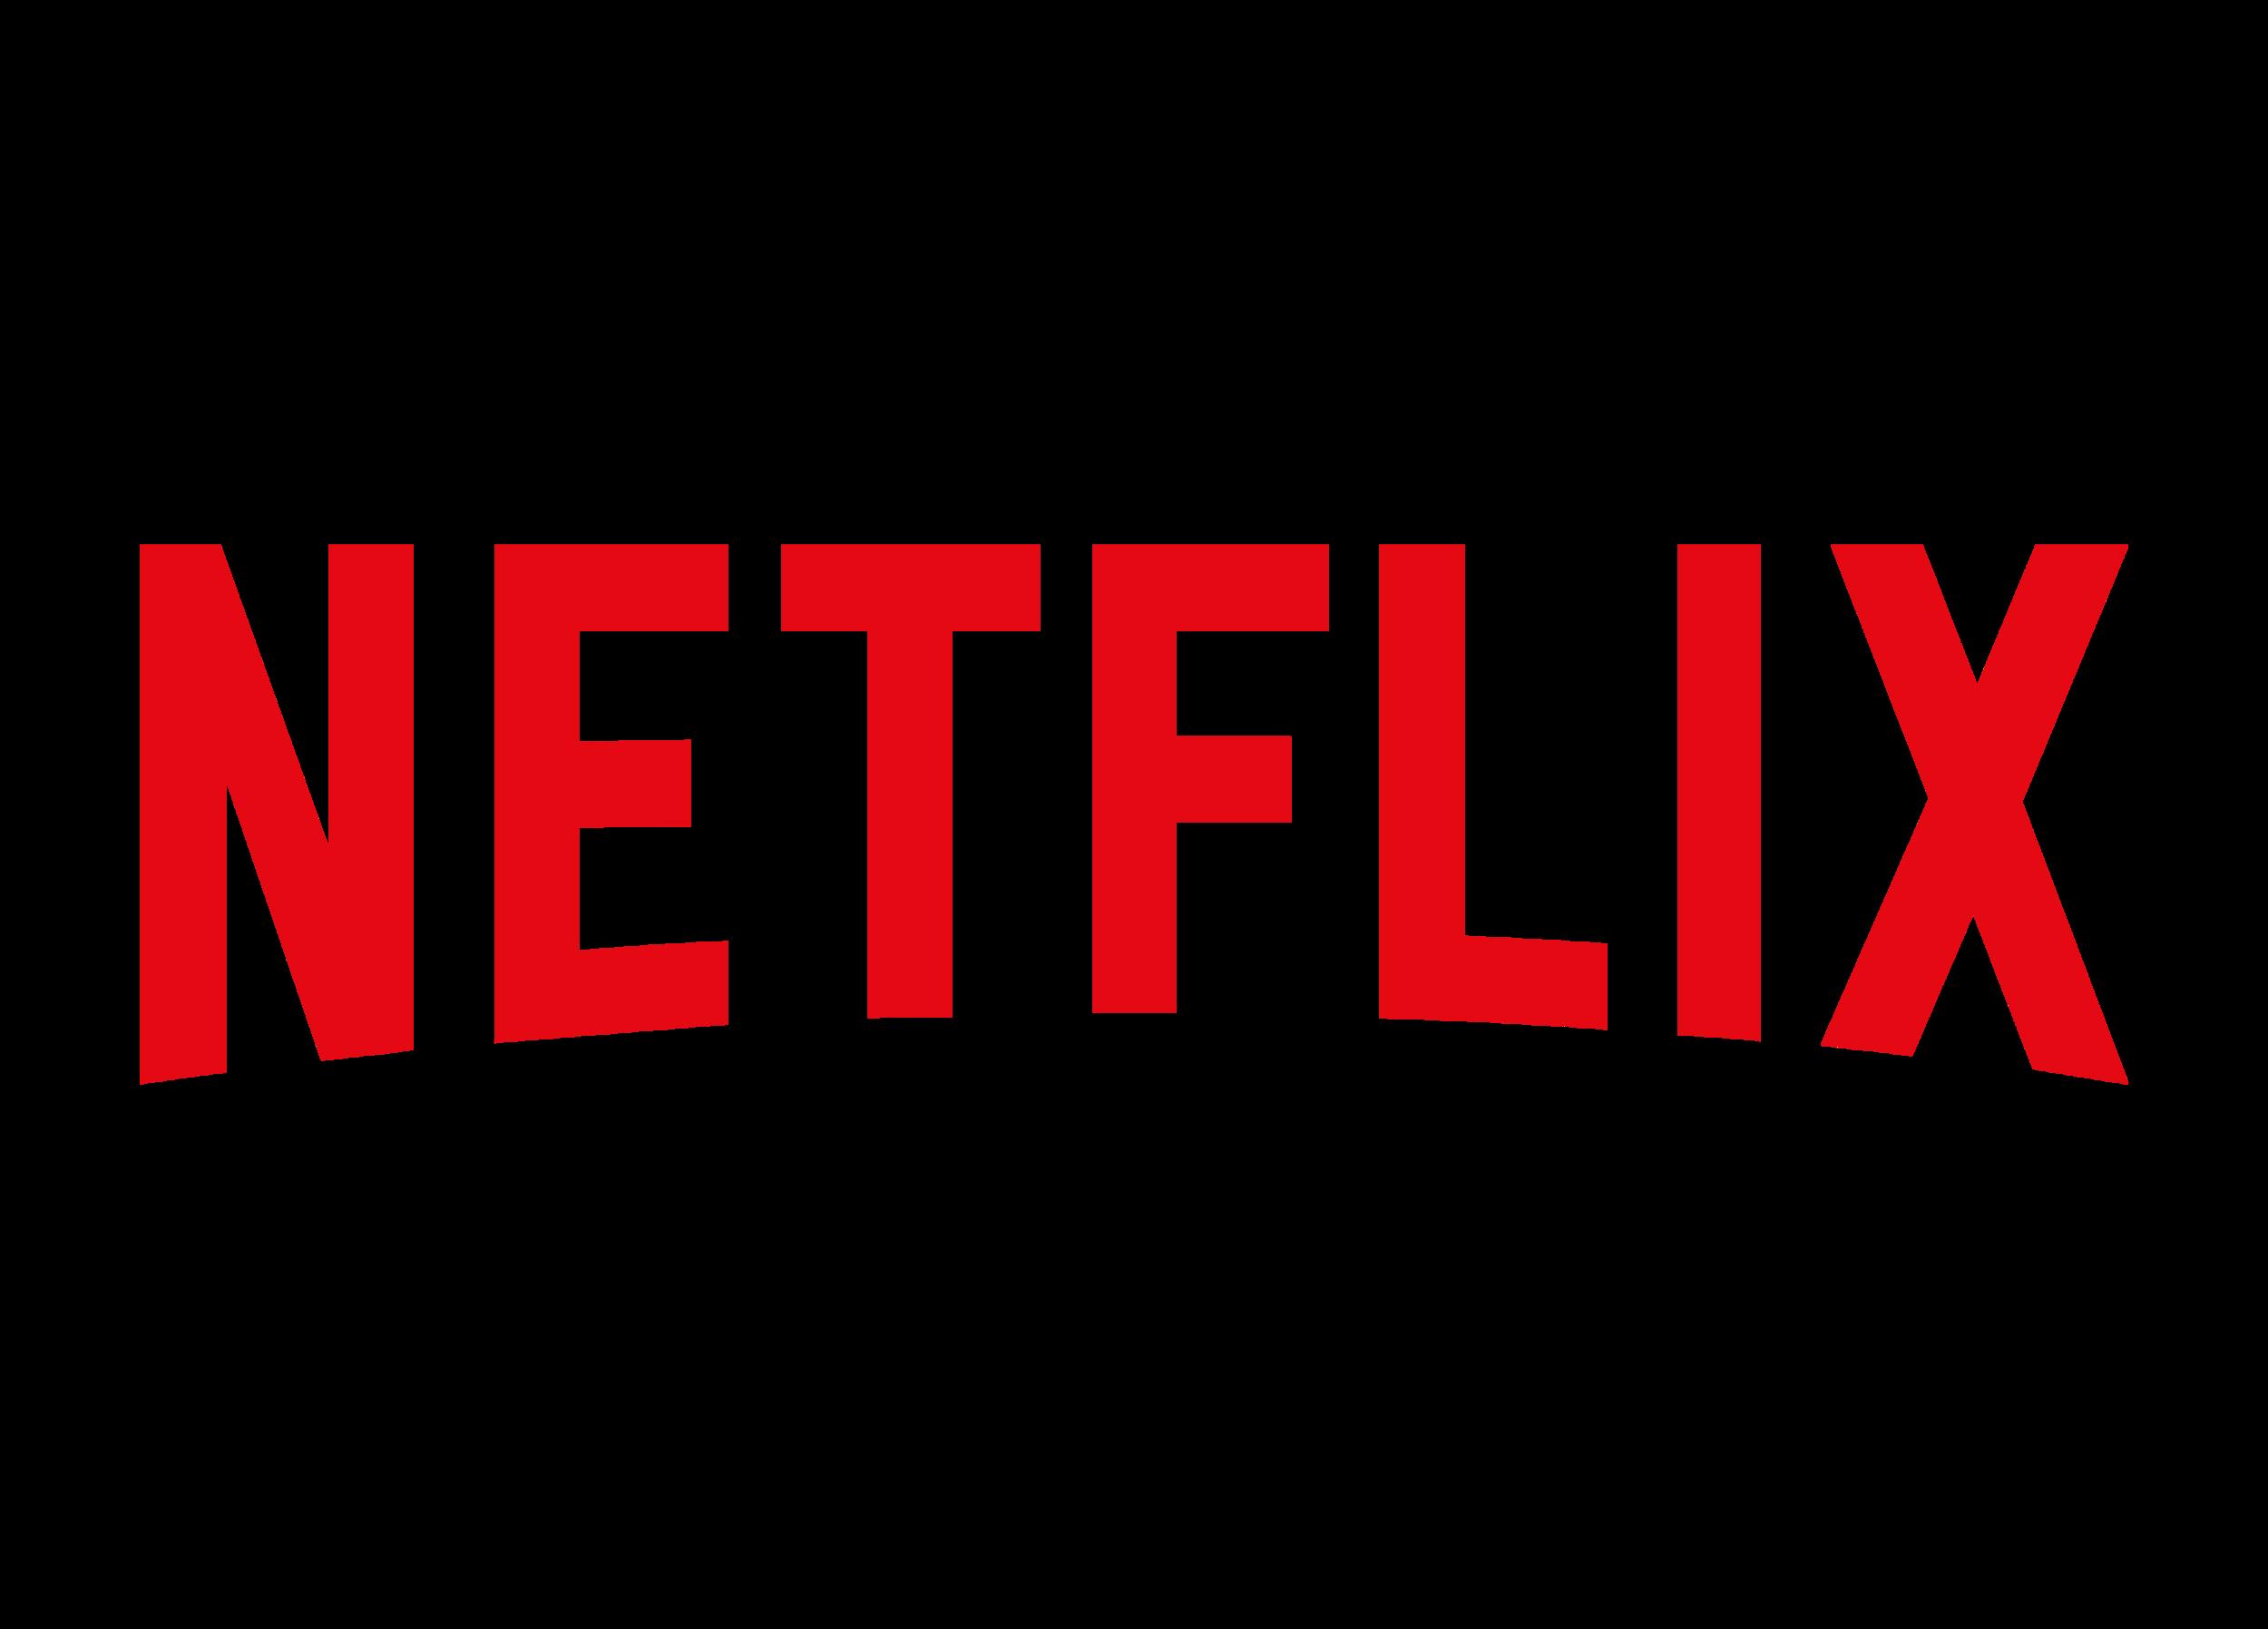 netflix-logo-5.png